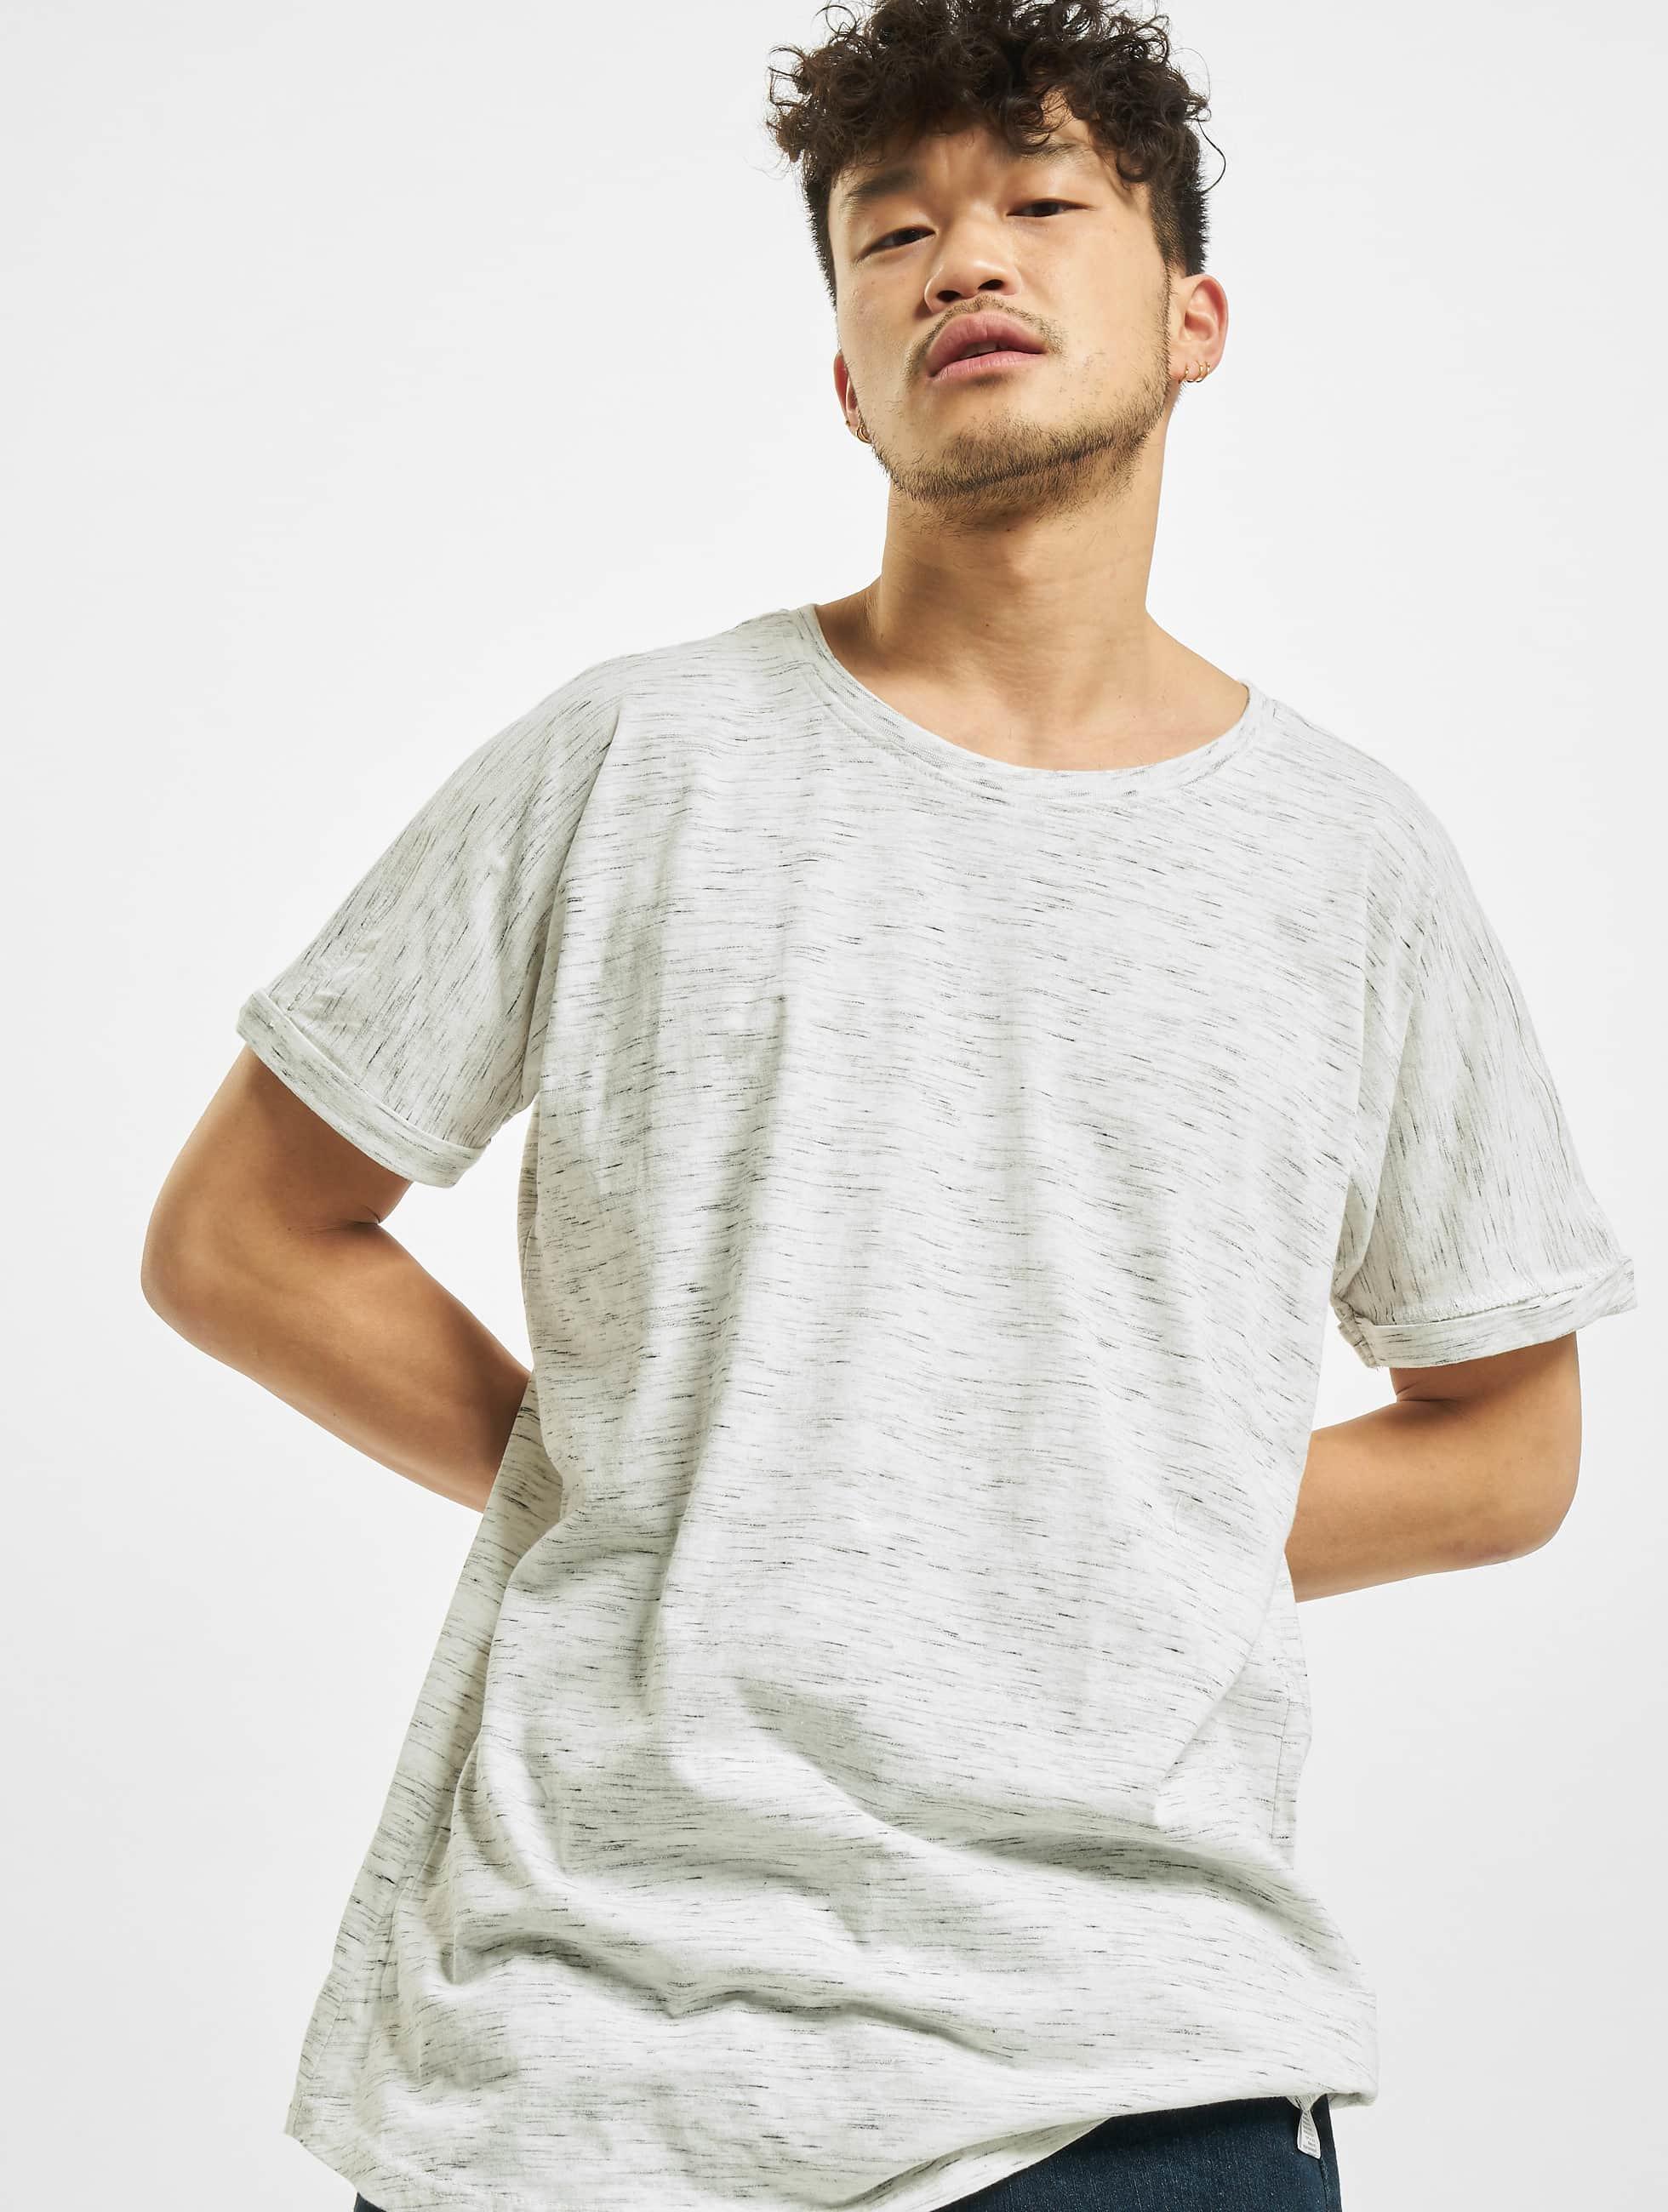 Urban Classics Long Space Dye Turn Up blanc T-Shirt homme